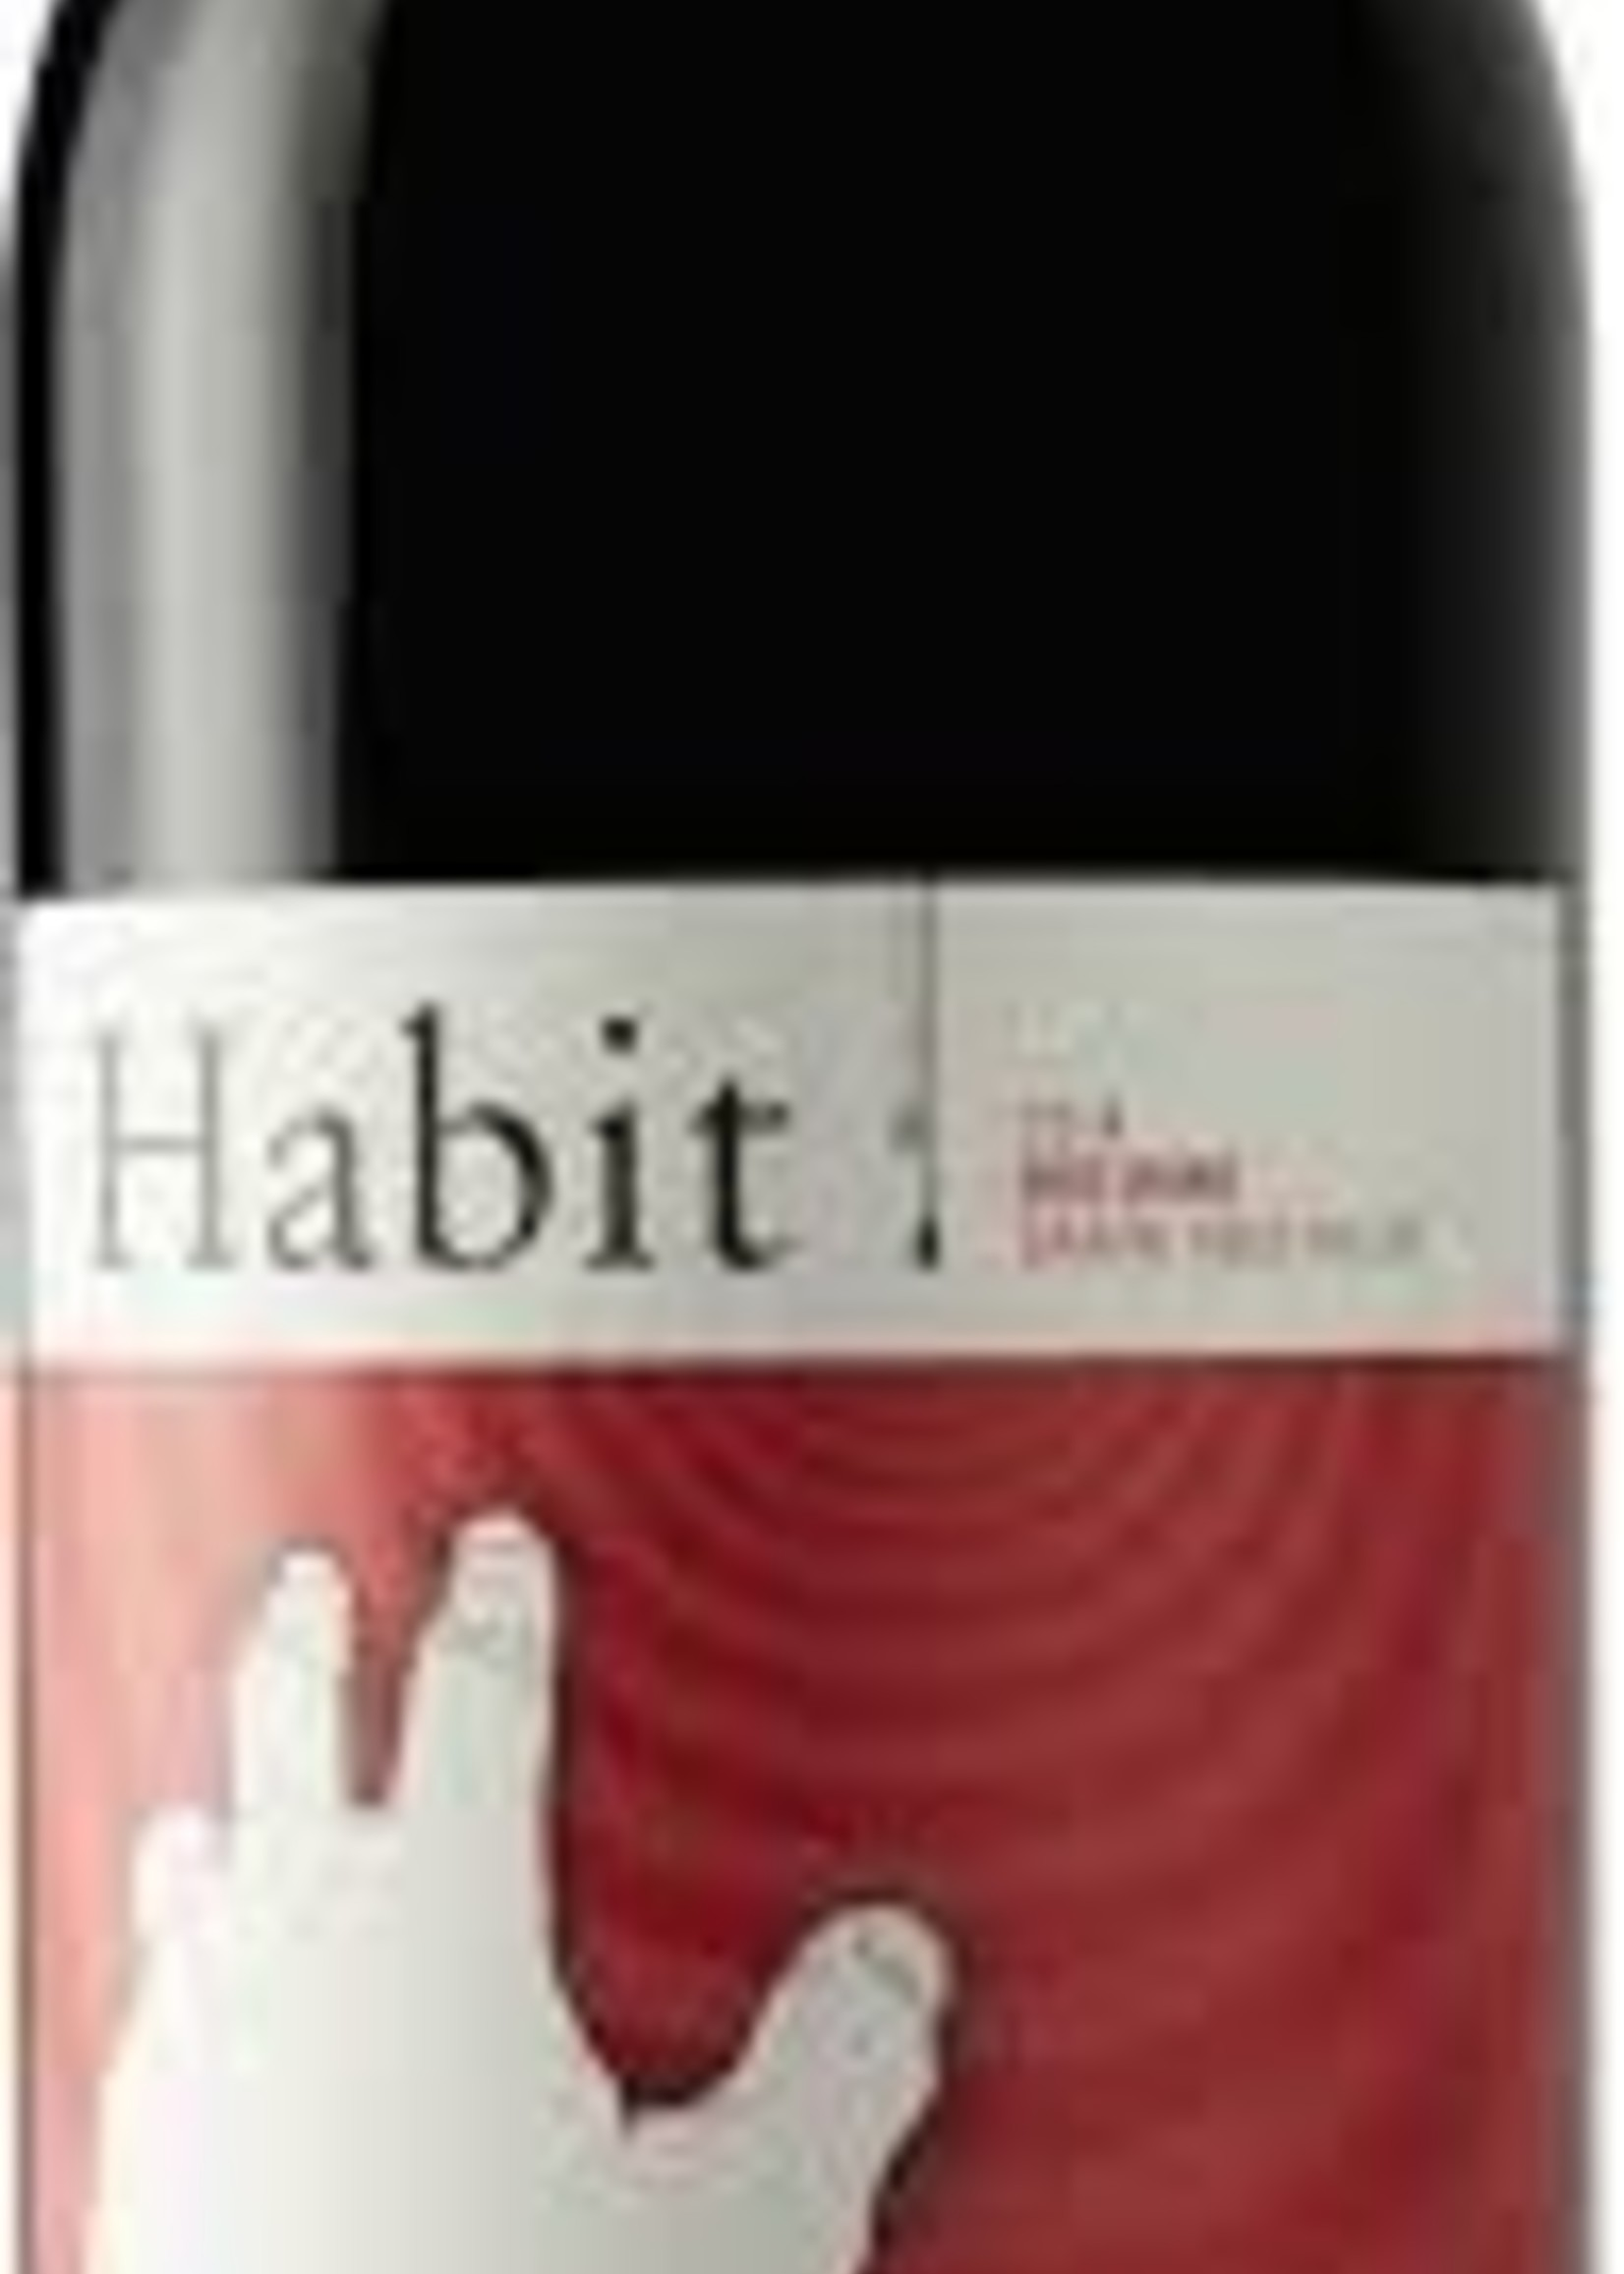 Habit Red Blend, Santa Ynez Valley, CA